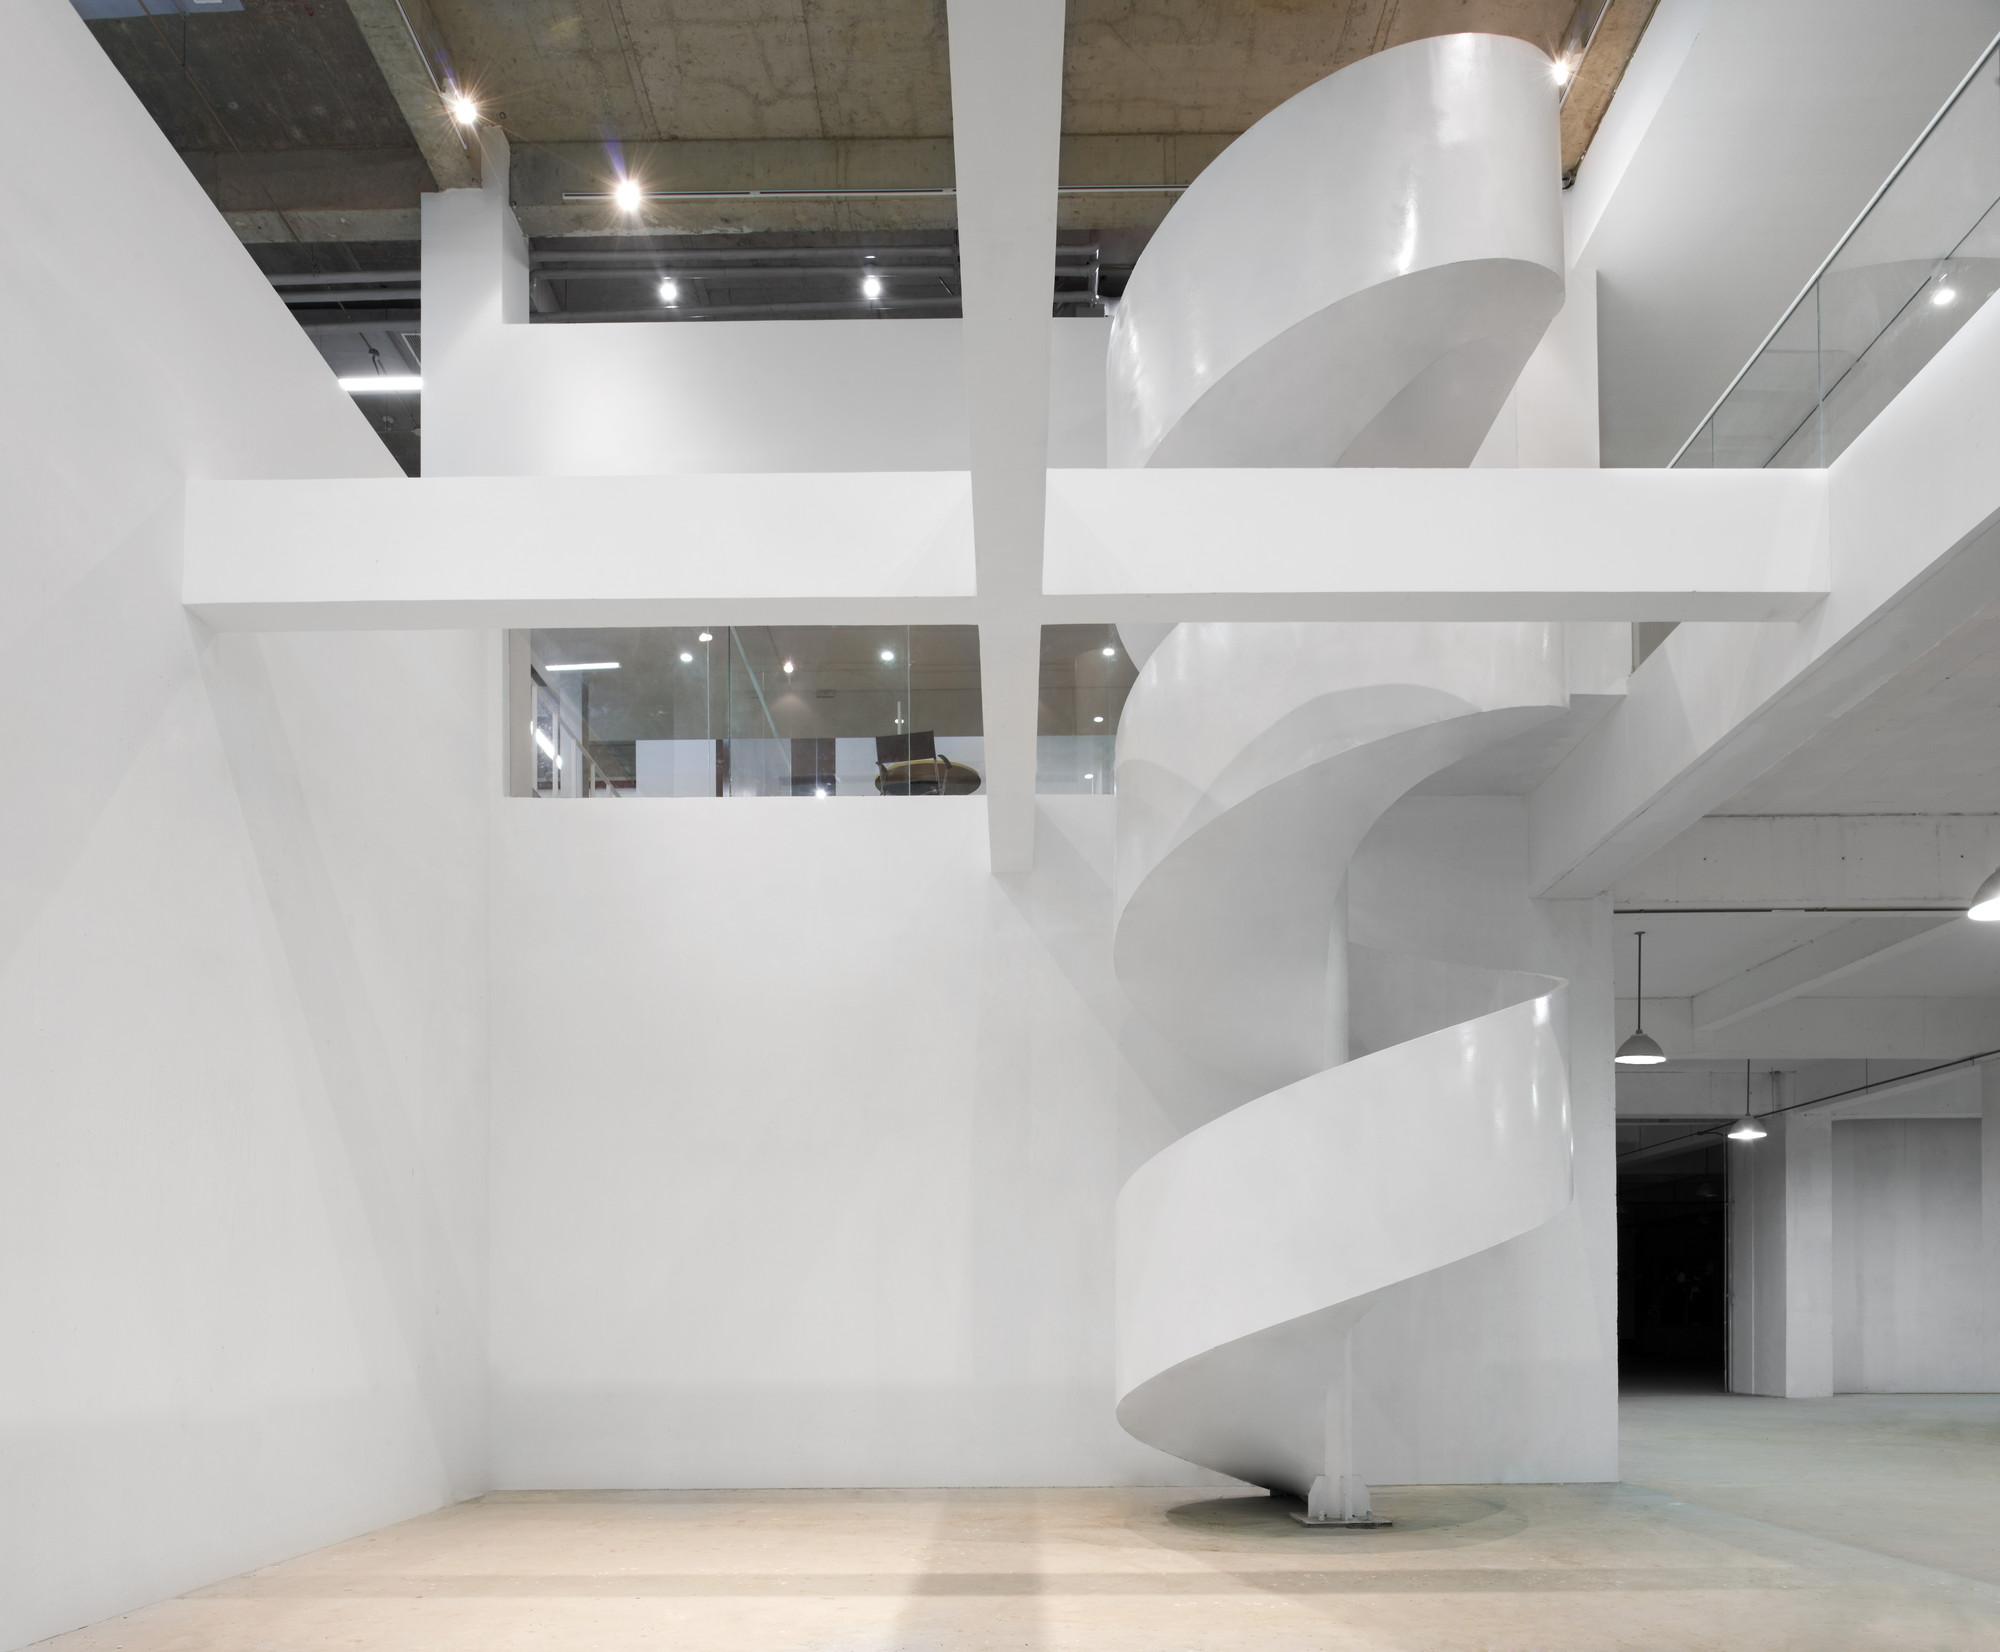 Daxing Factory Conversion / Nie Yong + Yoshimasa Tsutsumi, © Misae Hiromatsu